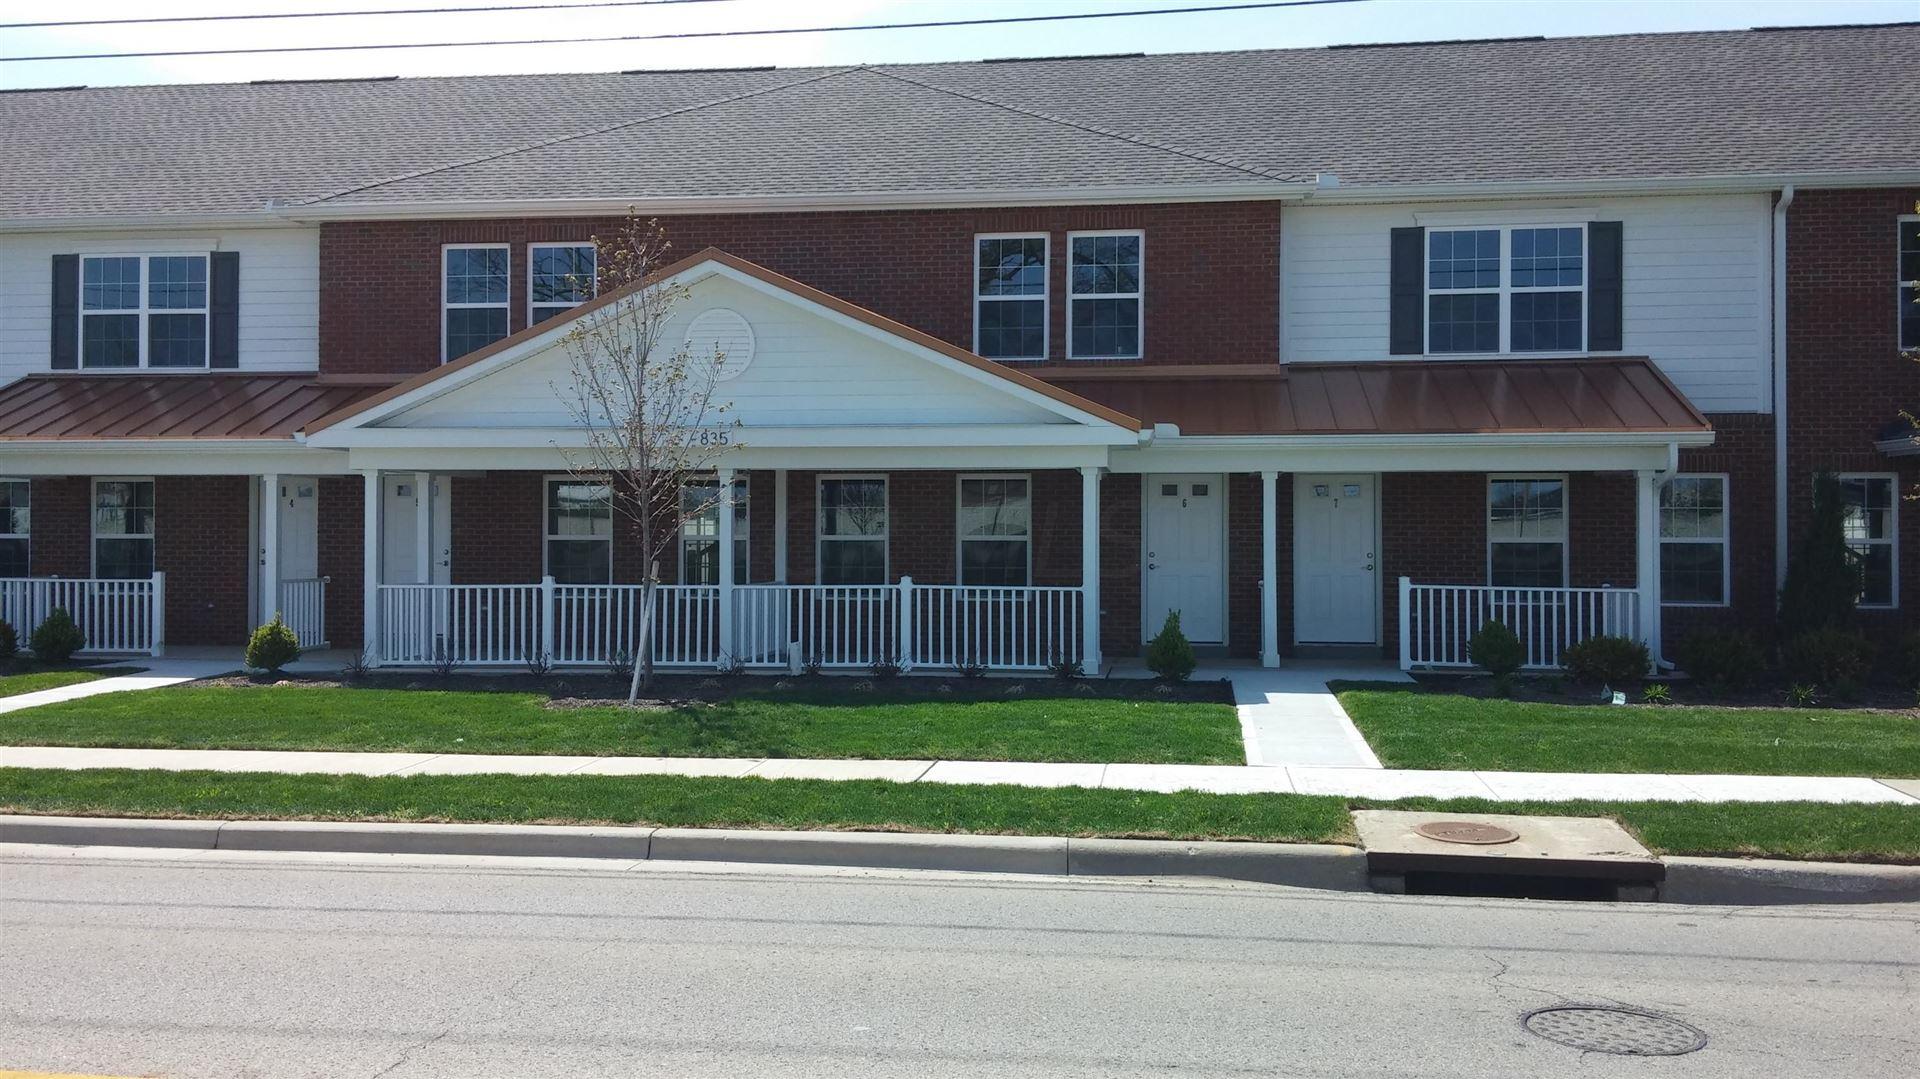 Photo of 835 Proprietors Road #Apt 8, Worthington, OH 43085 (MLS # 221027816)